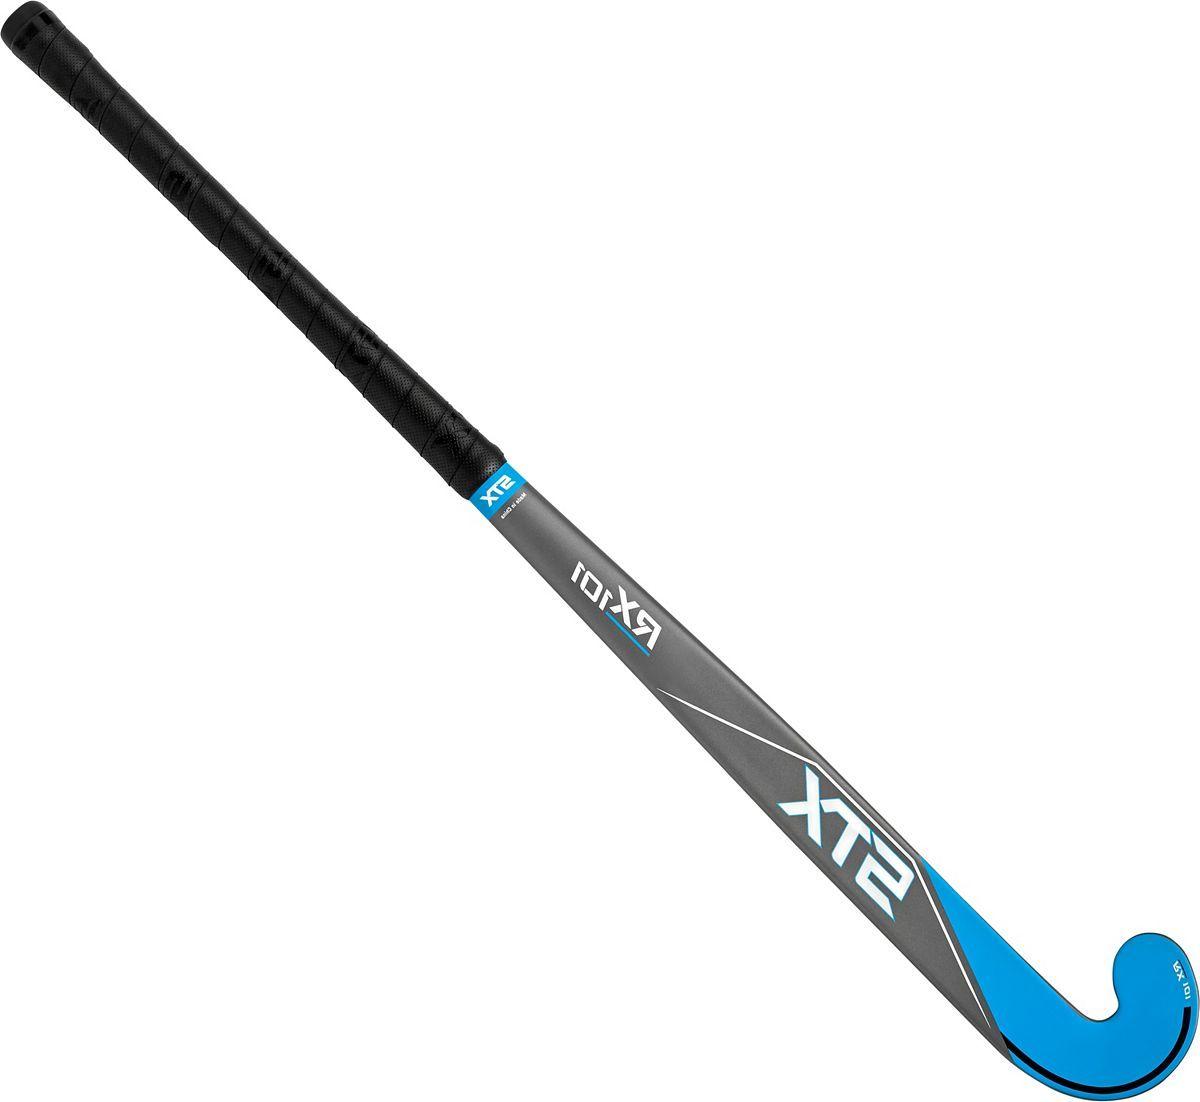 STX Surgeon RX 101 Field Hockey Stick